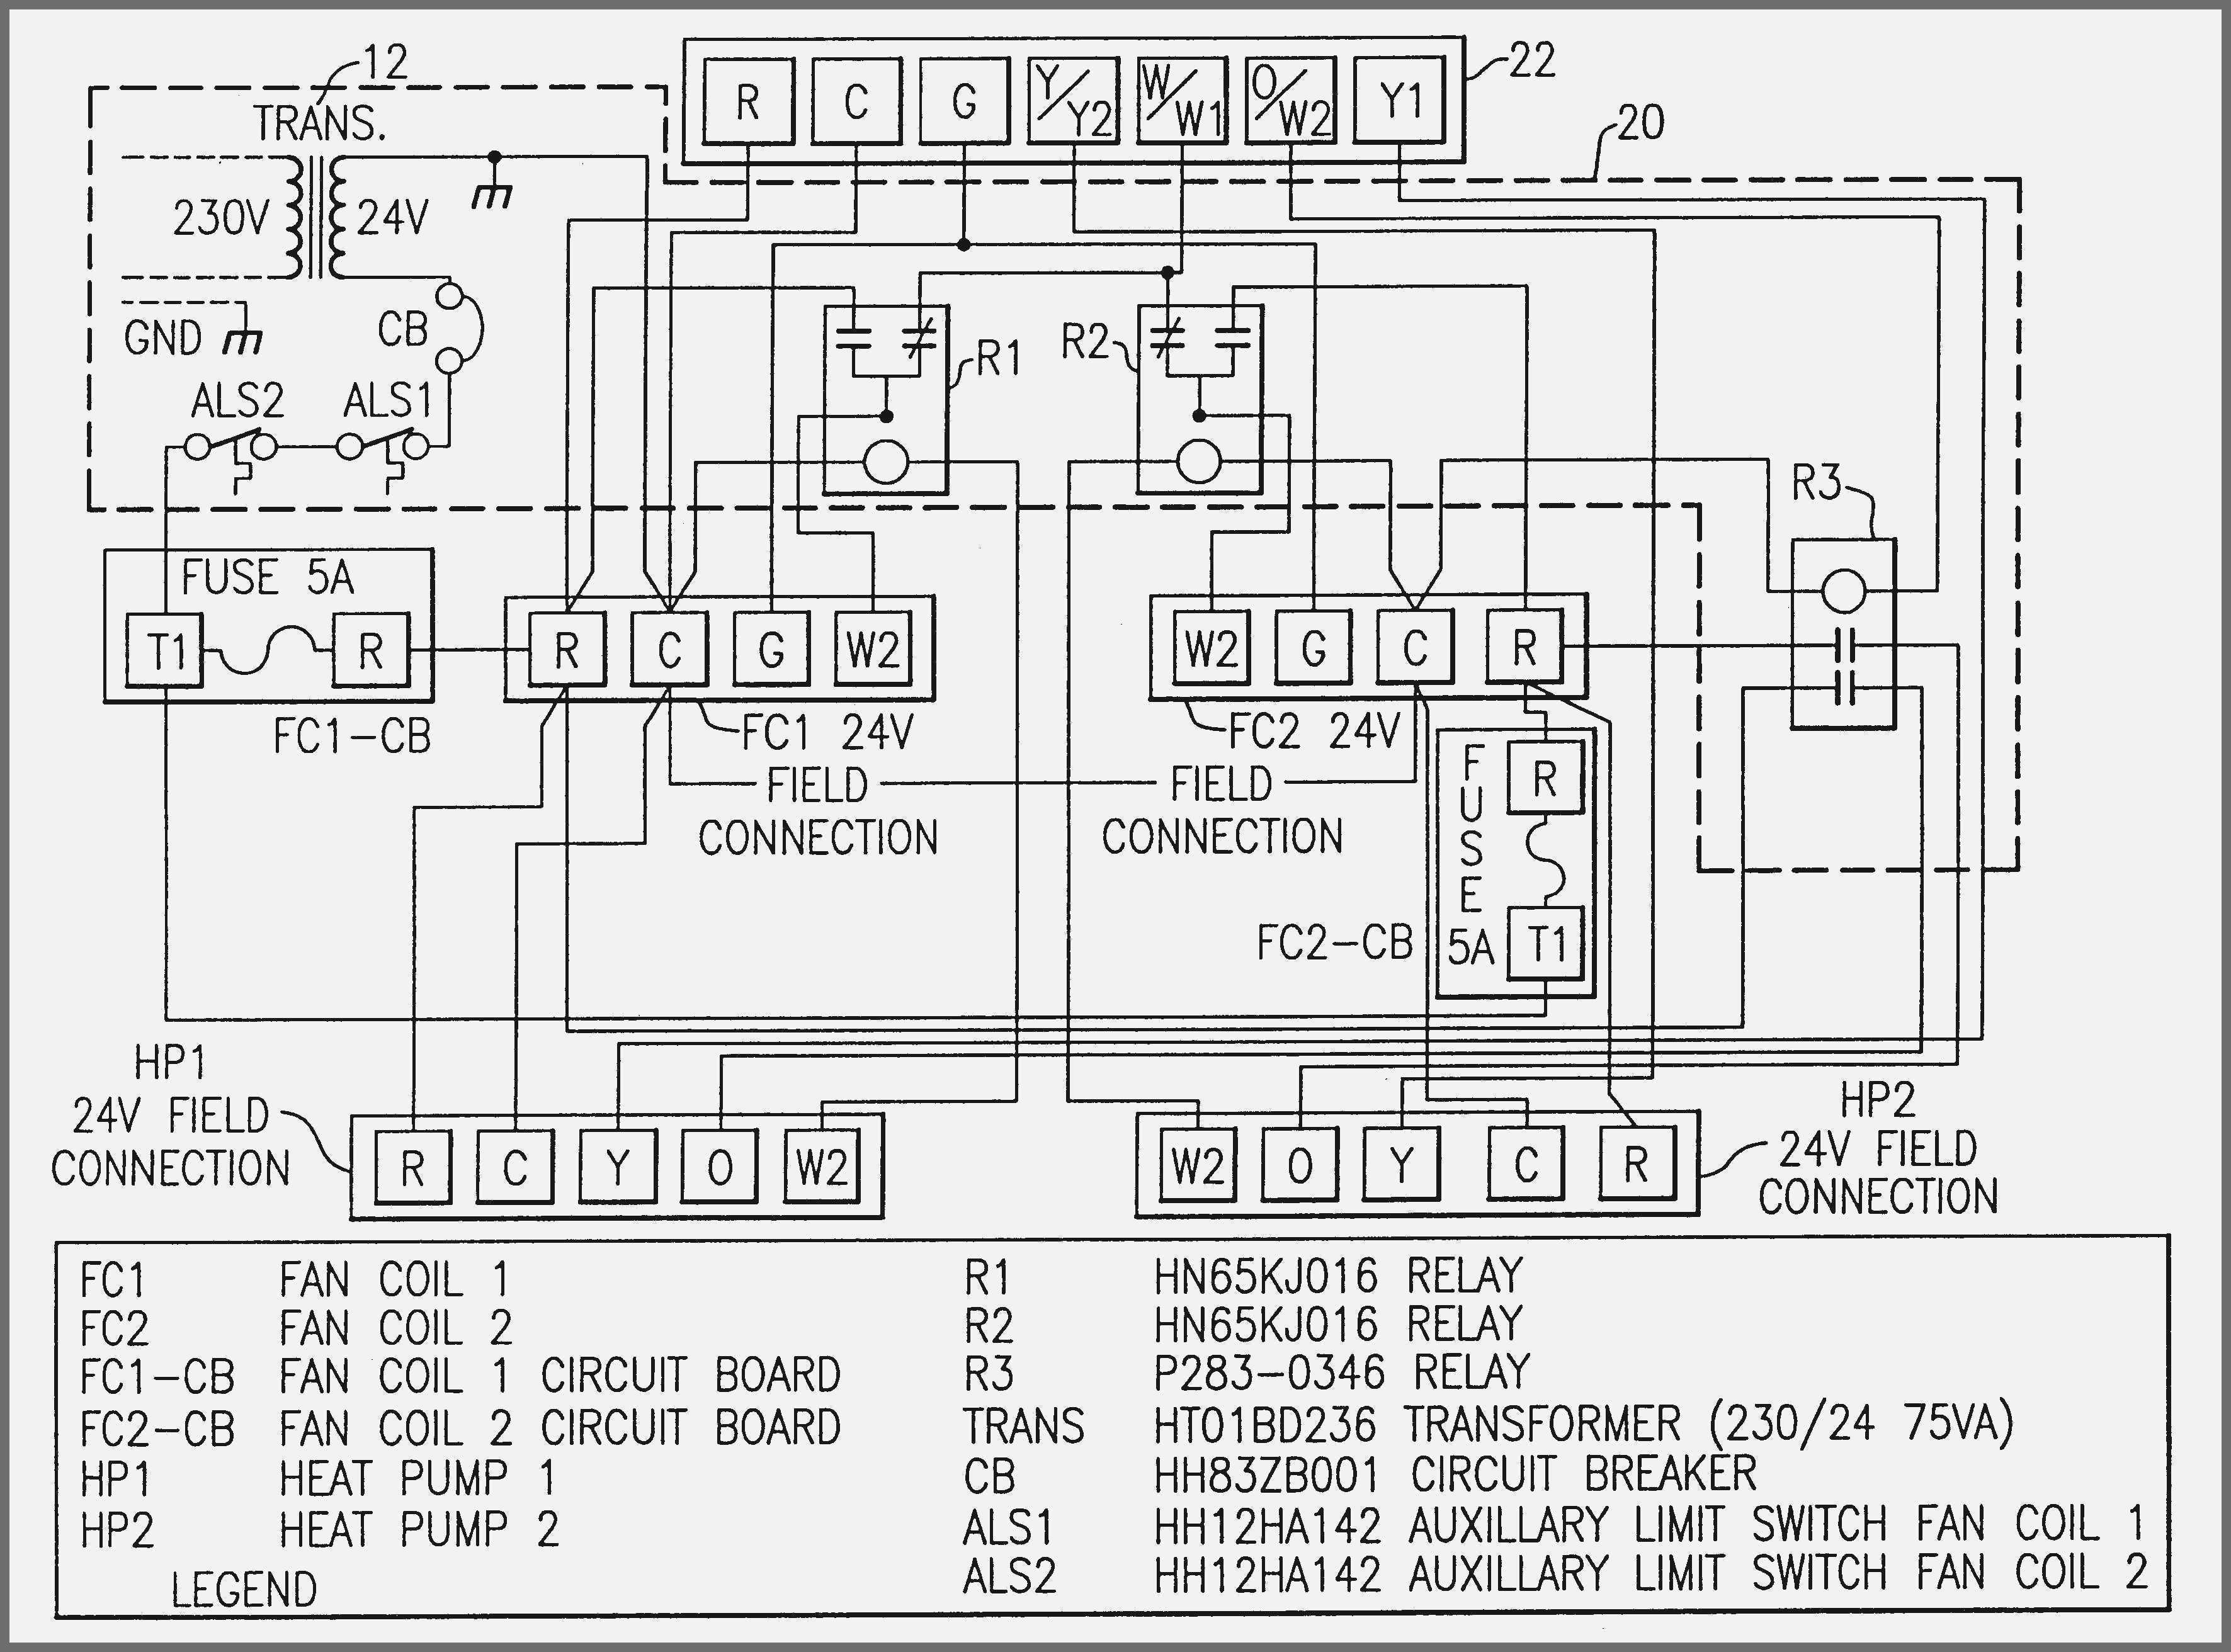 MF_6778] Wiring Diagram For Heat Tape Free DiagramCaba Bepta Drosi Wigeg Mohammedshrine Librar Wiring 101